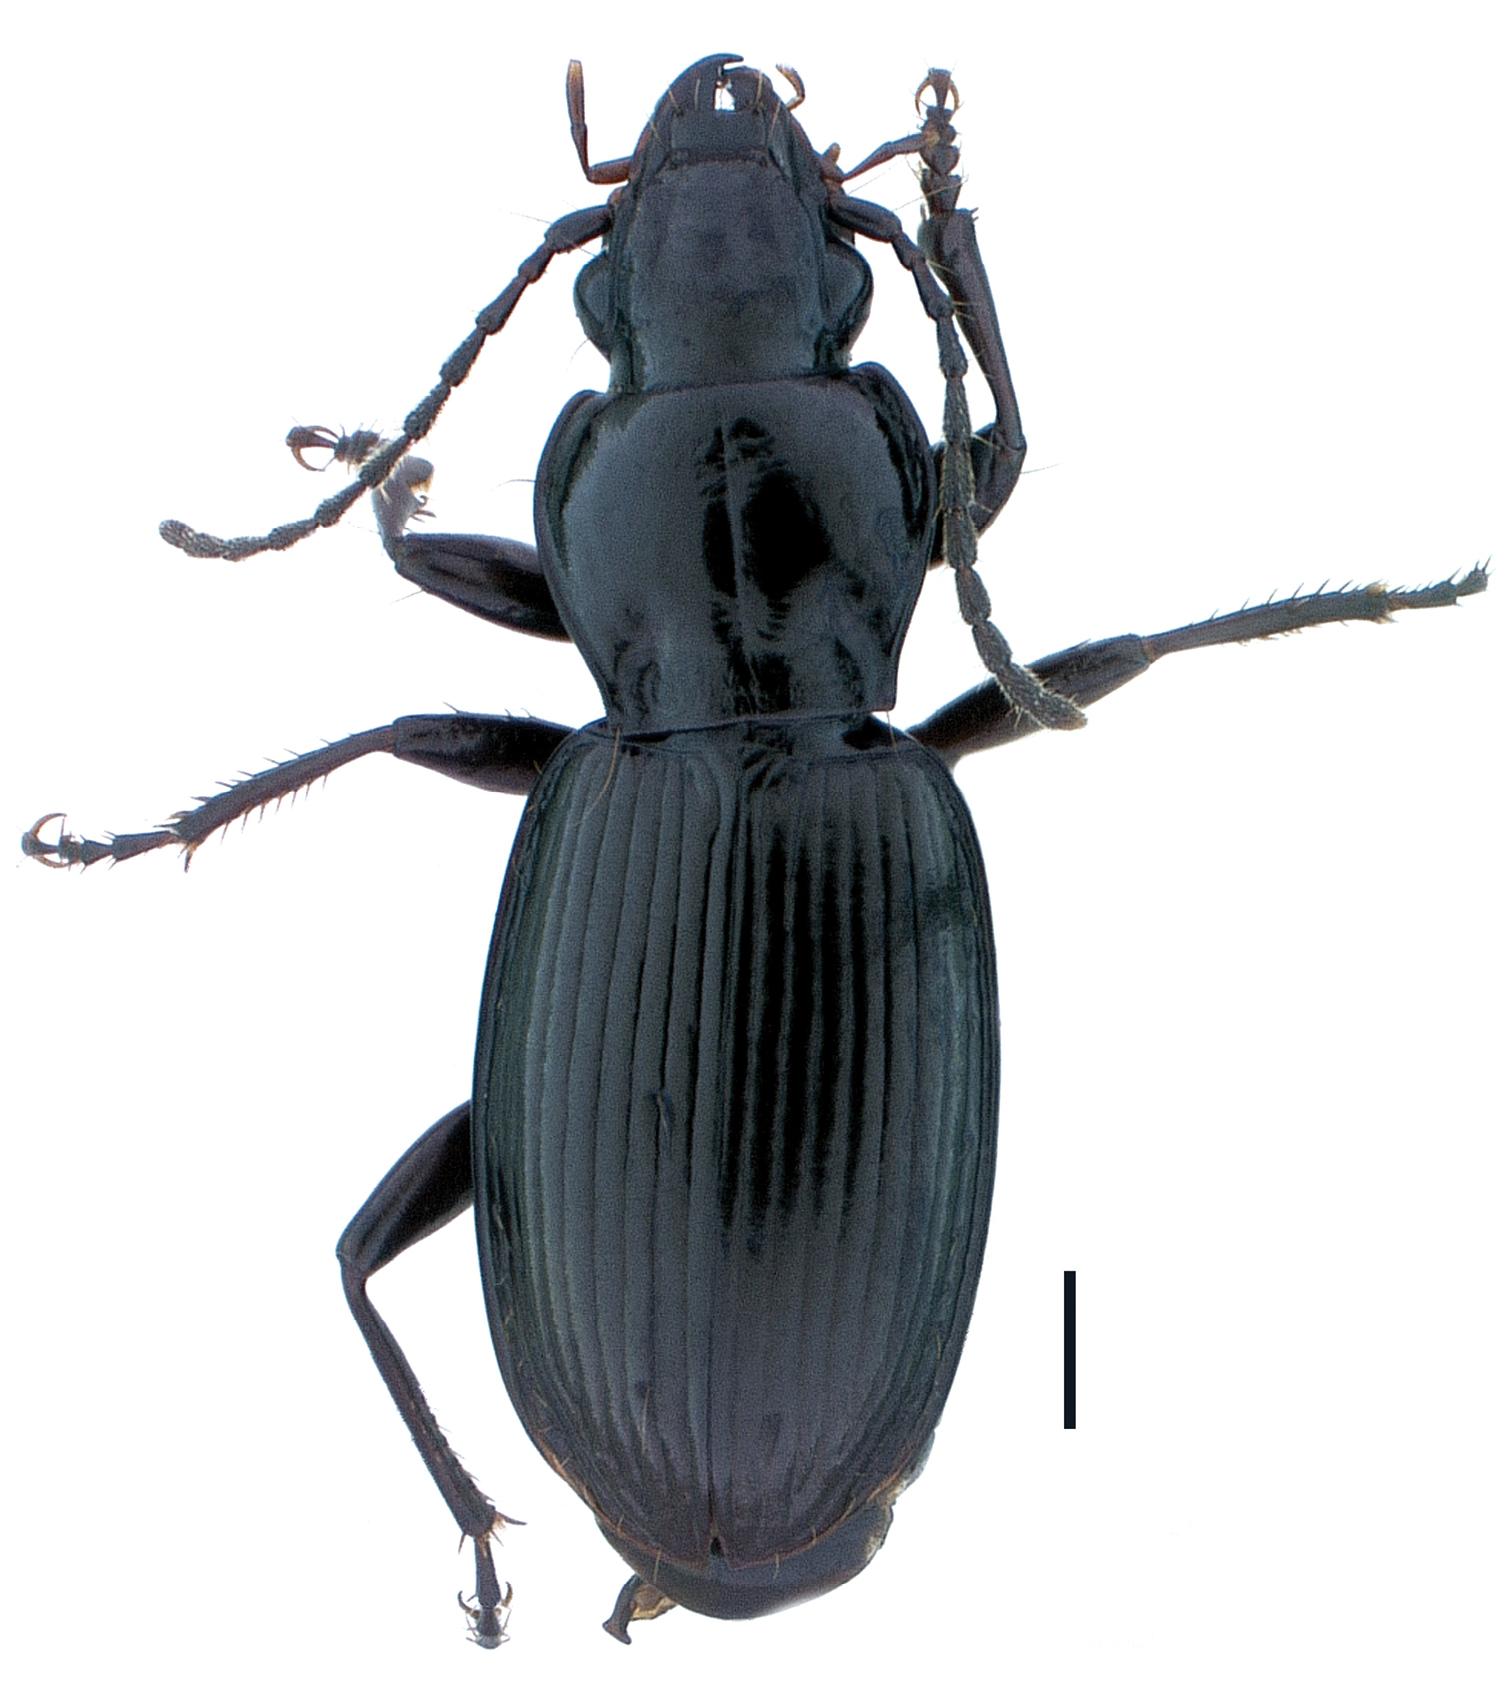 Pterostichus (Pseudoferonina) bousqueti Holotype